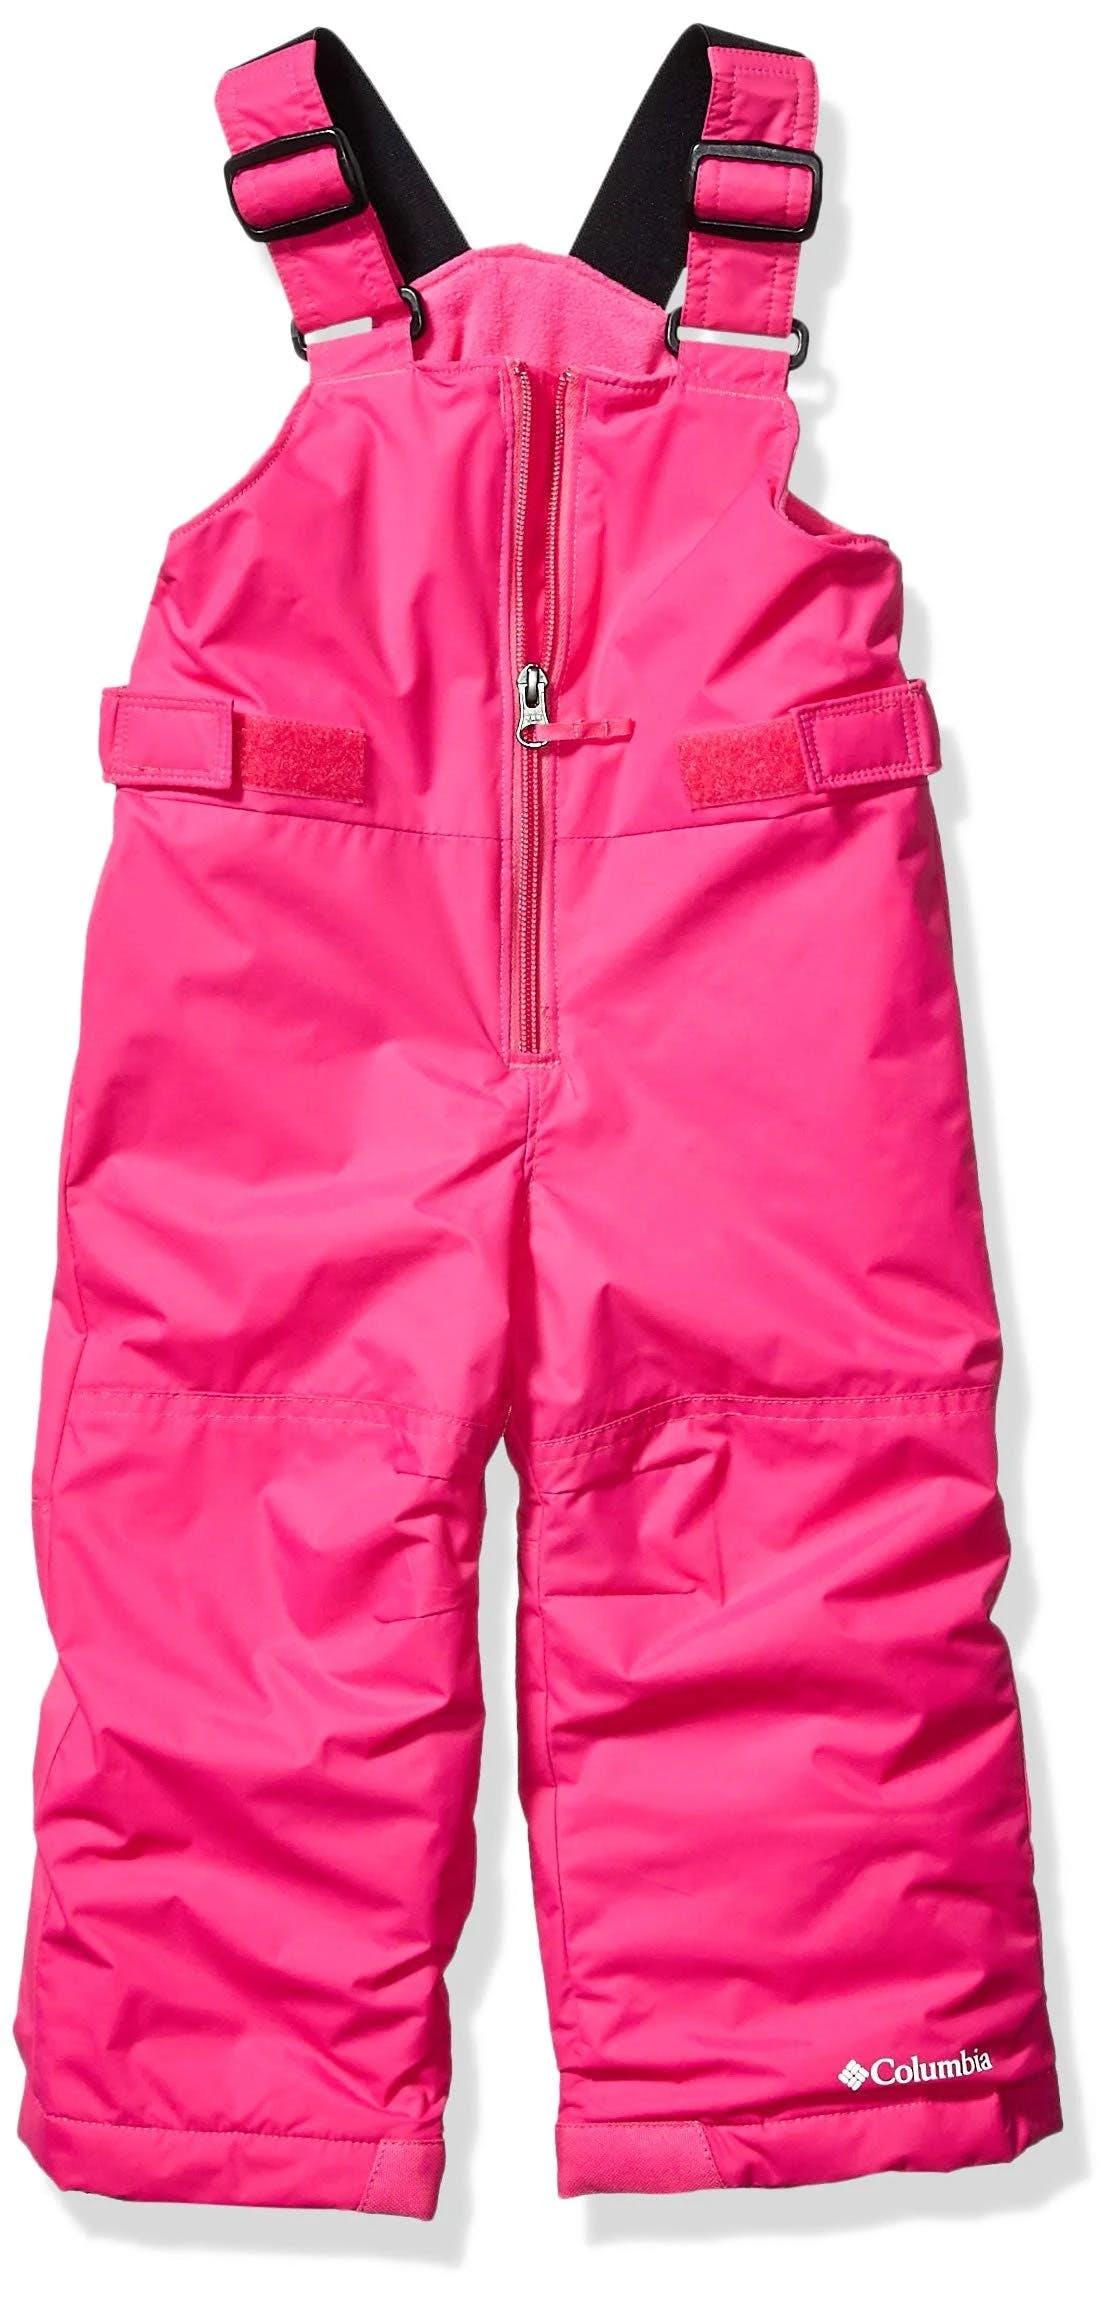 Columbia Girls' Snowslope II Bib XL Pink Pants